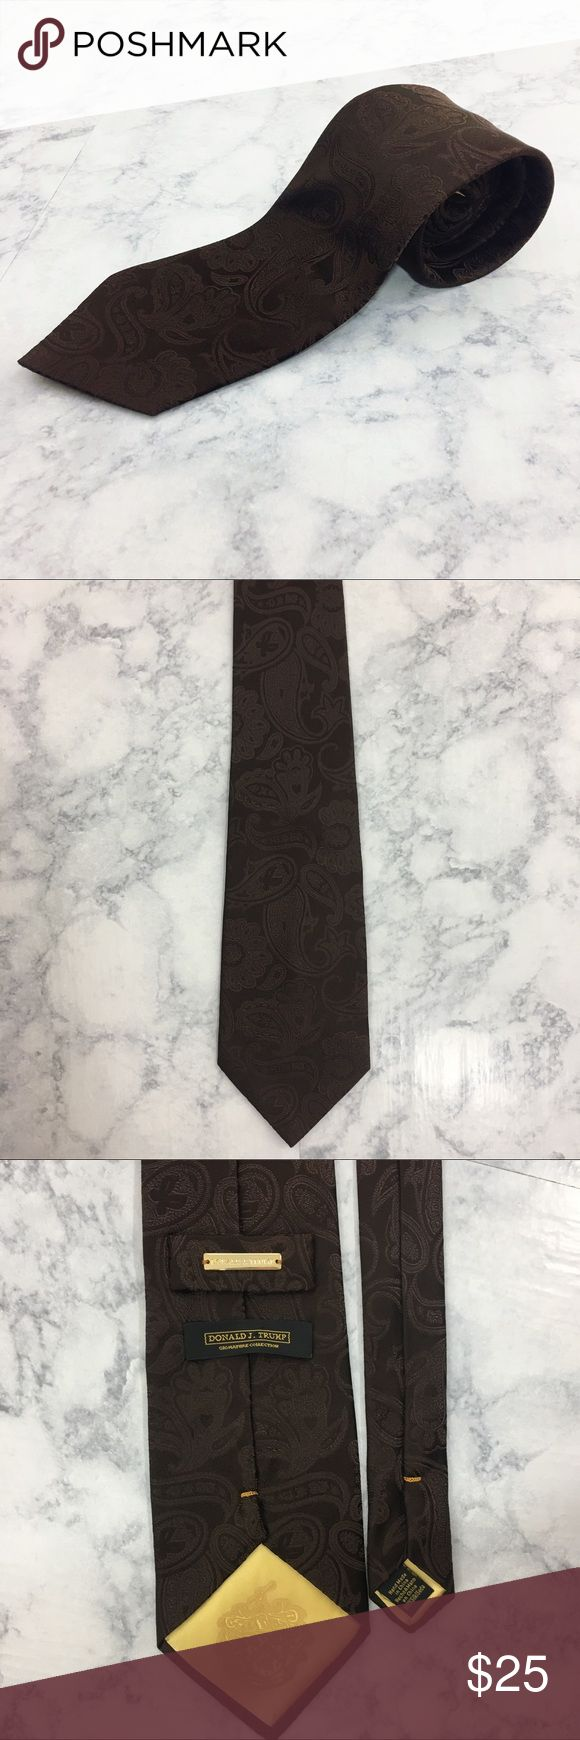 Donald Trump Signature Collection Tie Excellent used condition. Donald J. Trump Signiture Collection Silk Brown Tie. Paisley design. Donald J. Trump Accessories Ties